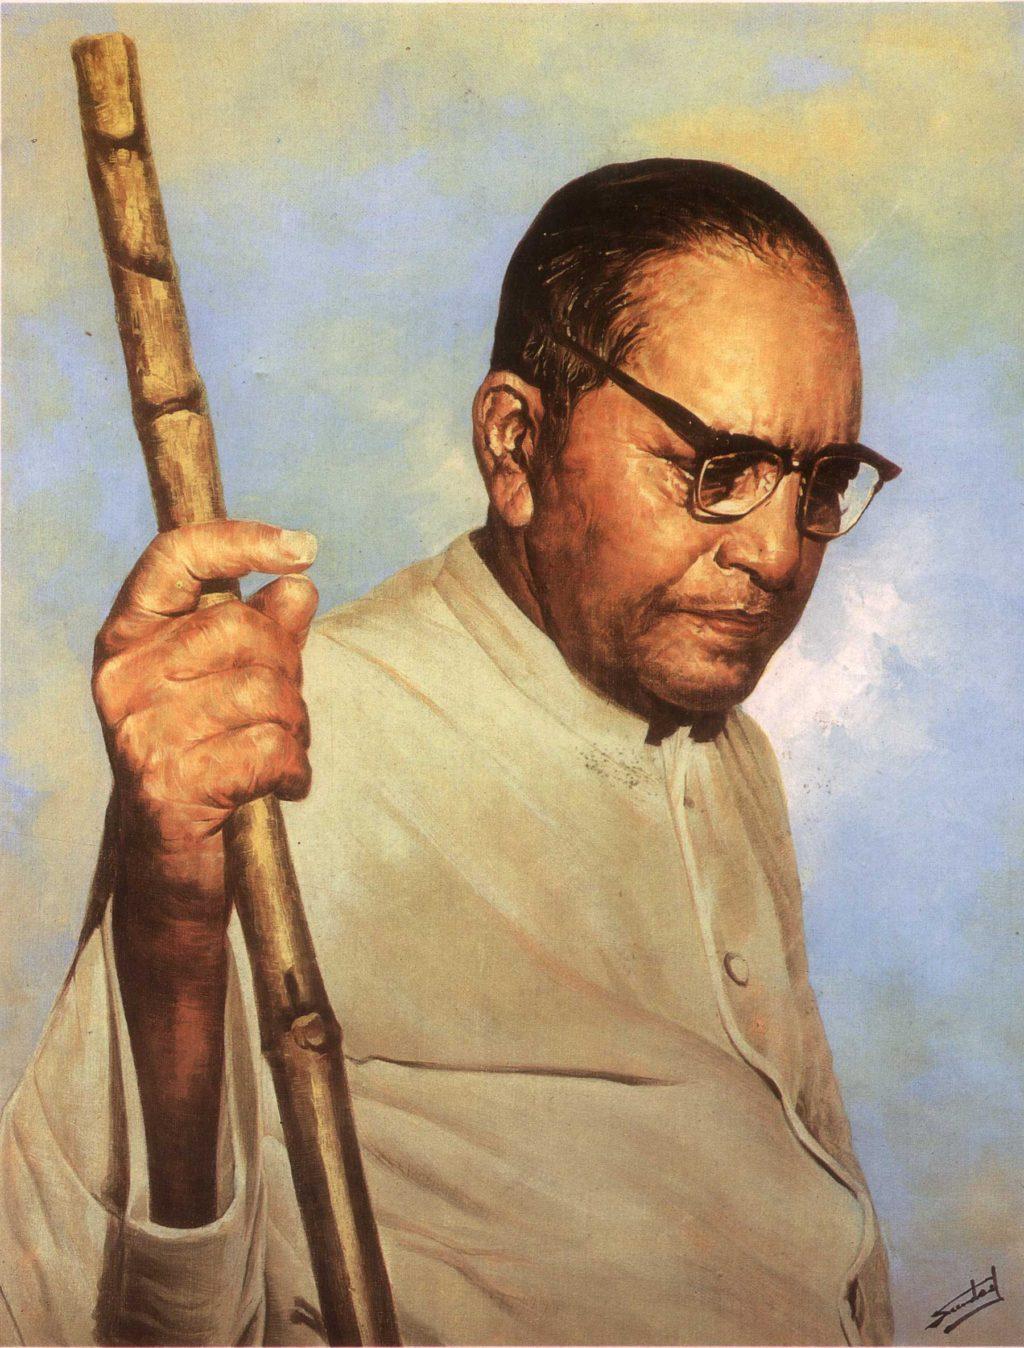 When will India speak on Dalit lives matter? 1